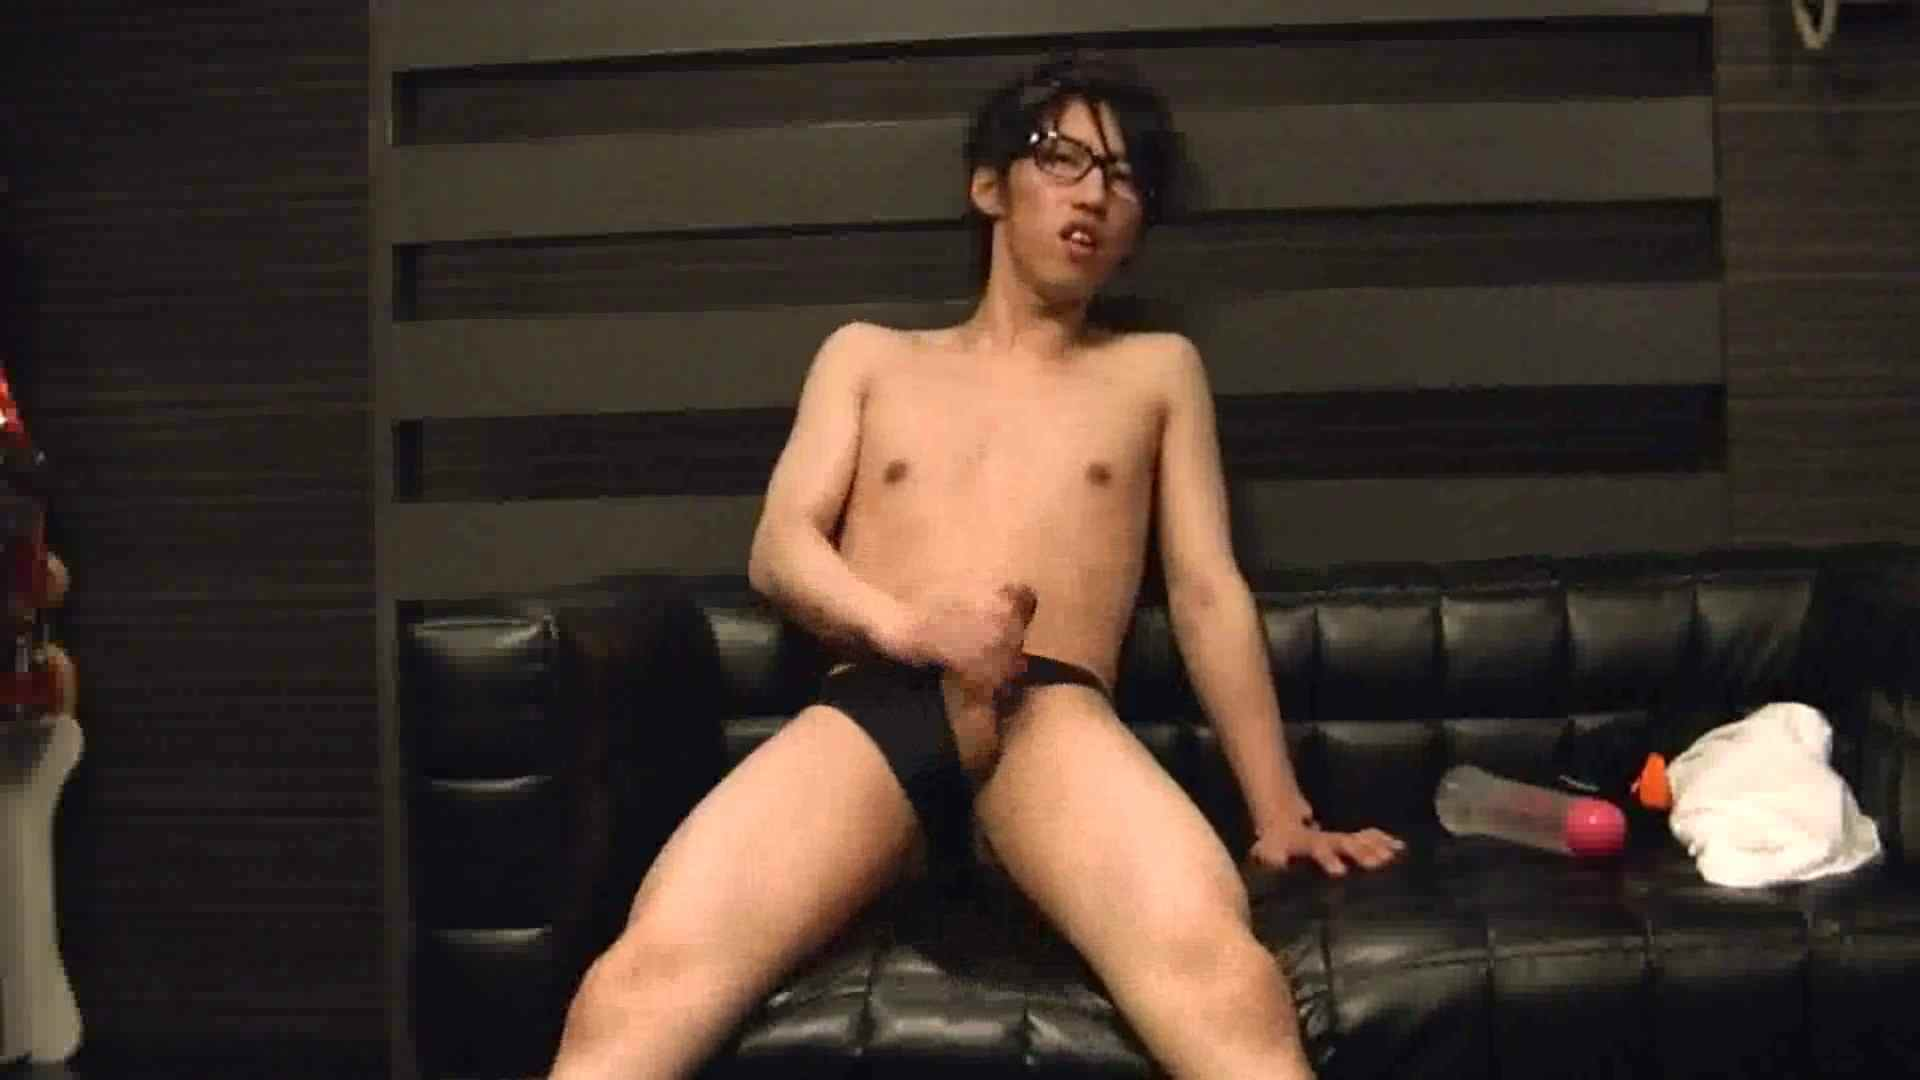 ONA見せカーニバル!! Vol3 男  93pic 82